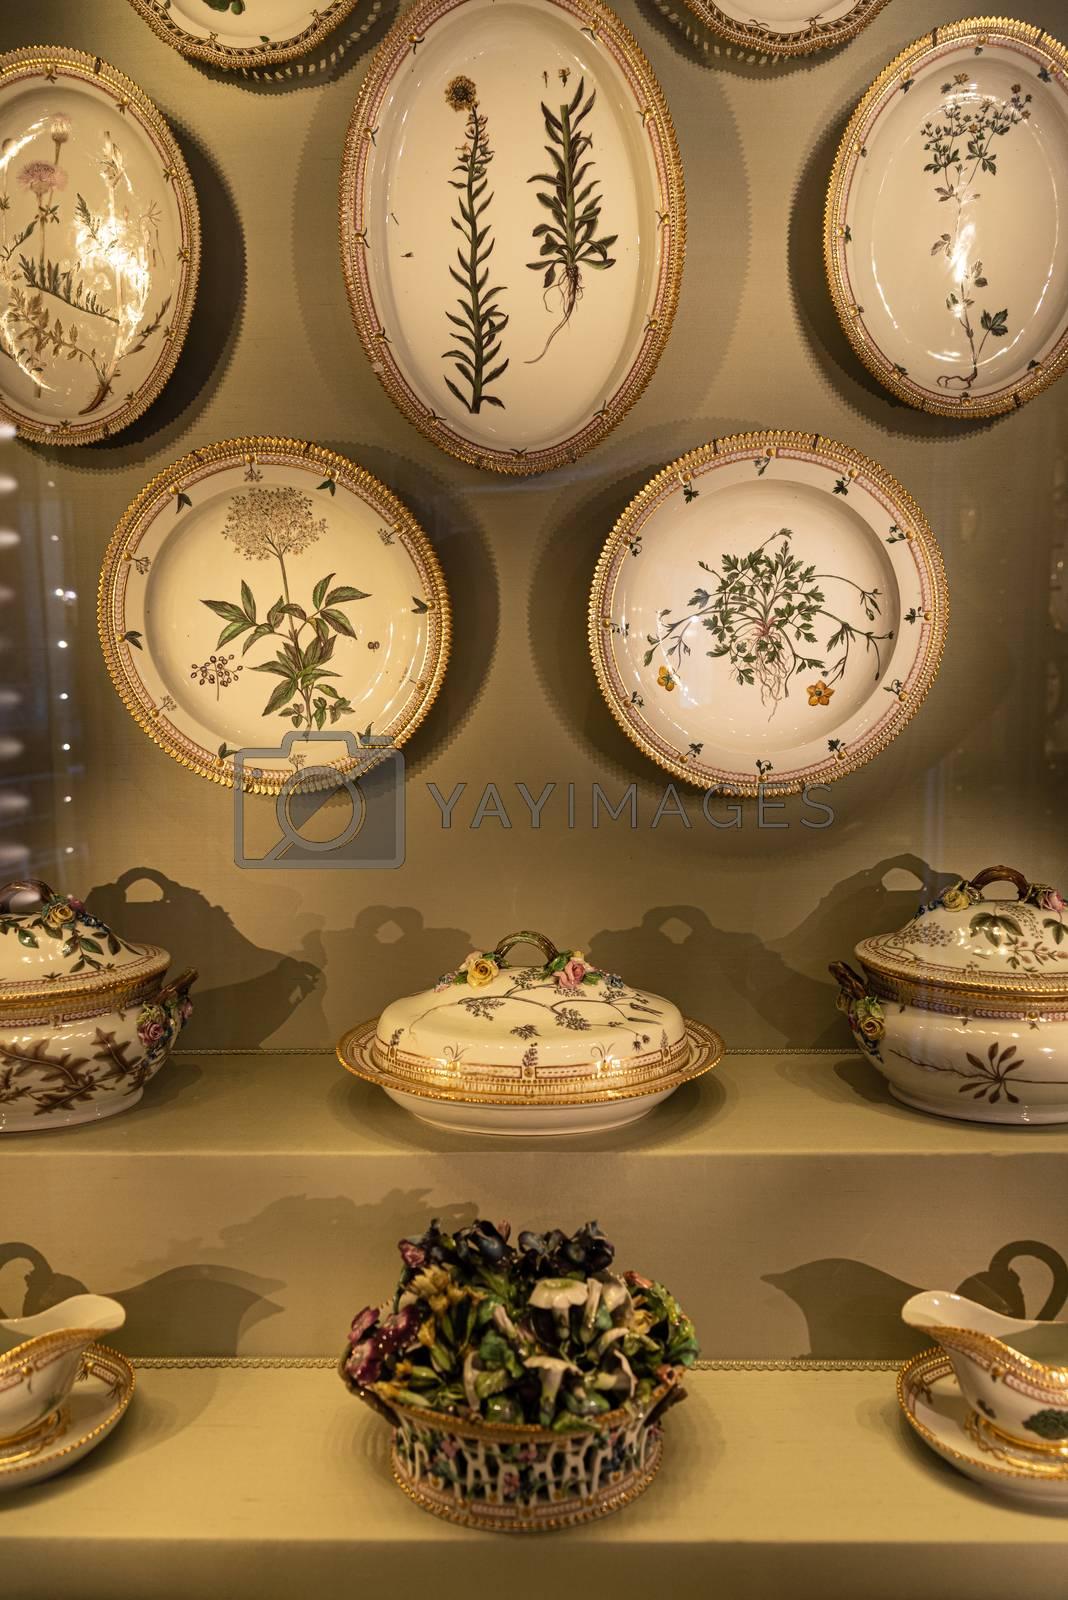 Interiors of royal halls in Christiansborg Palace in Copenhagen Denmark, detail of vintage royal tableware